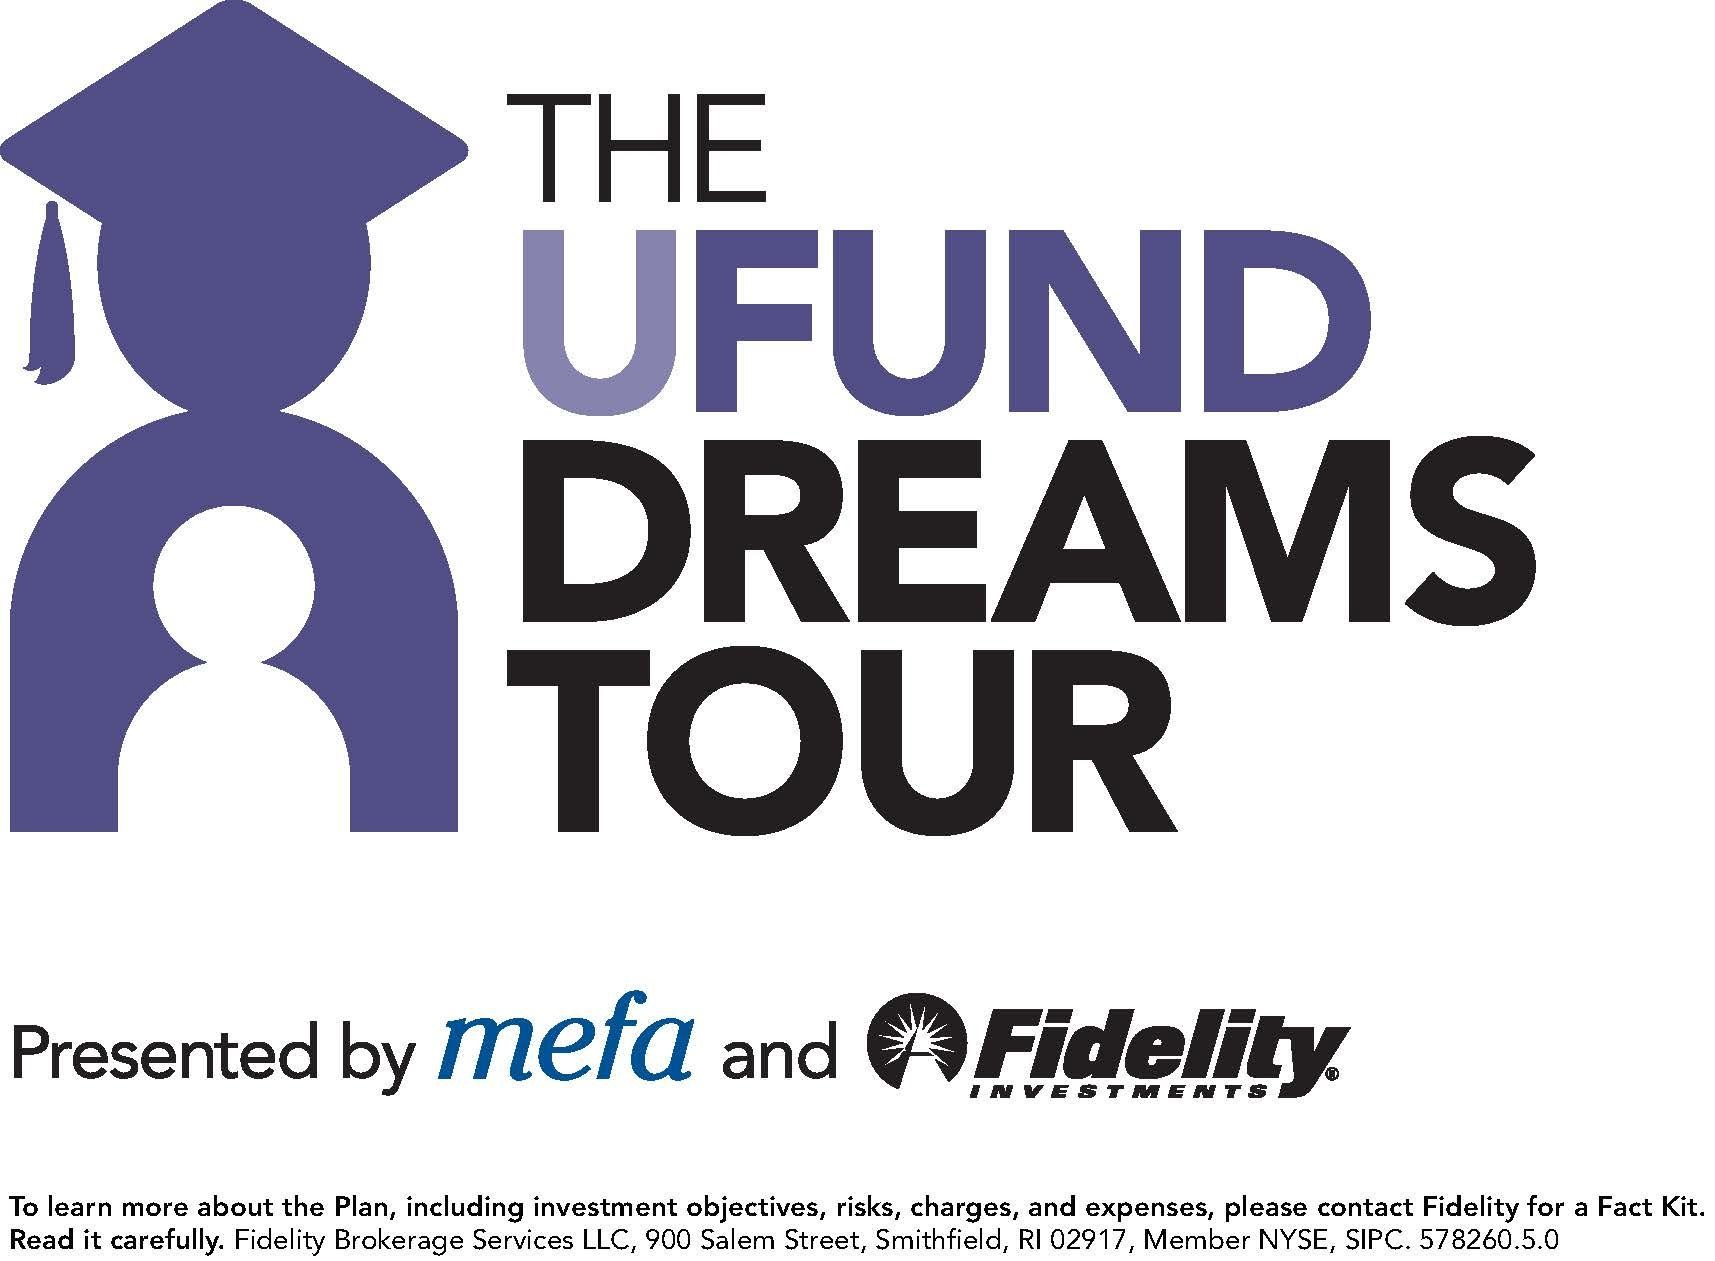 u-fund-dreams-tour-mefa.jpg